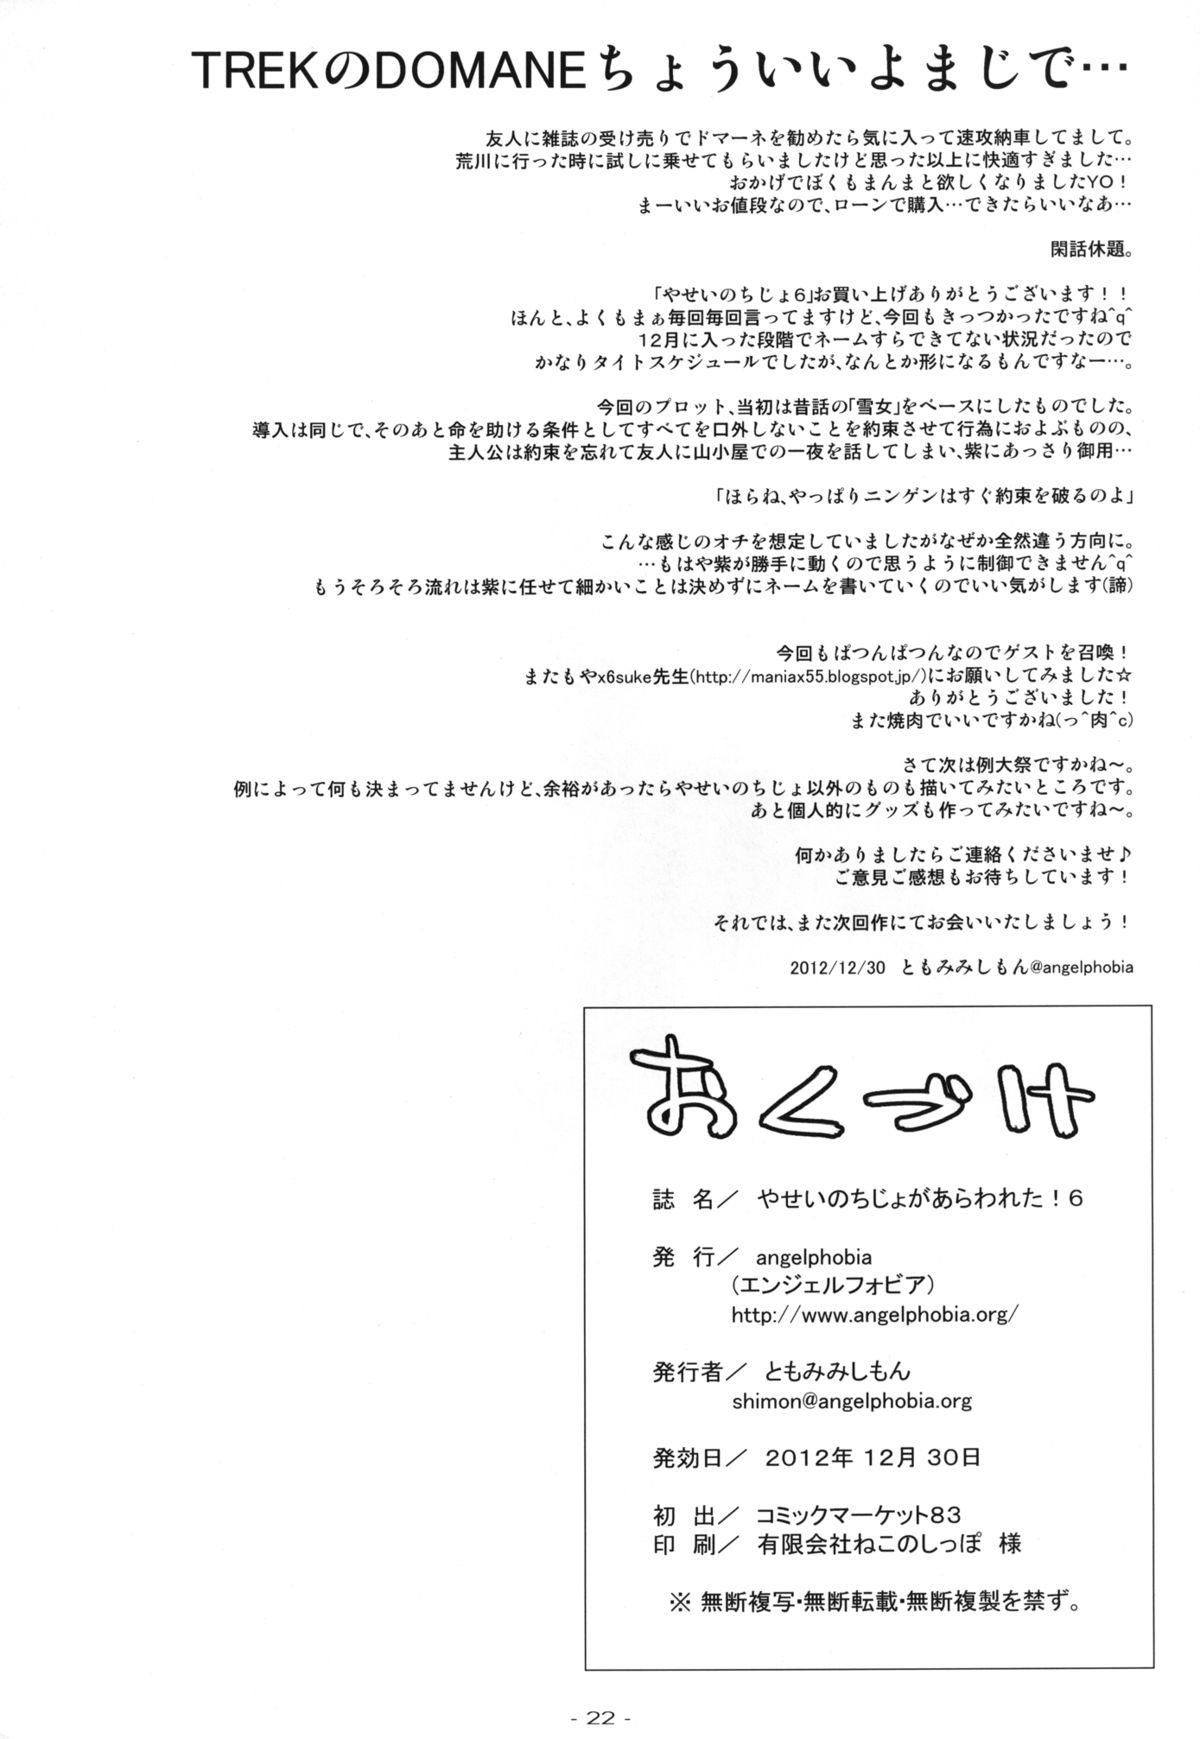 Yasei no Chijo ga Arawareta! 6 | A Wild Nymphomaniac Appeared! 6 20